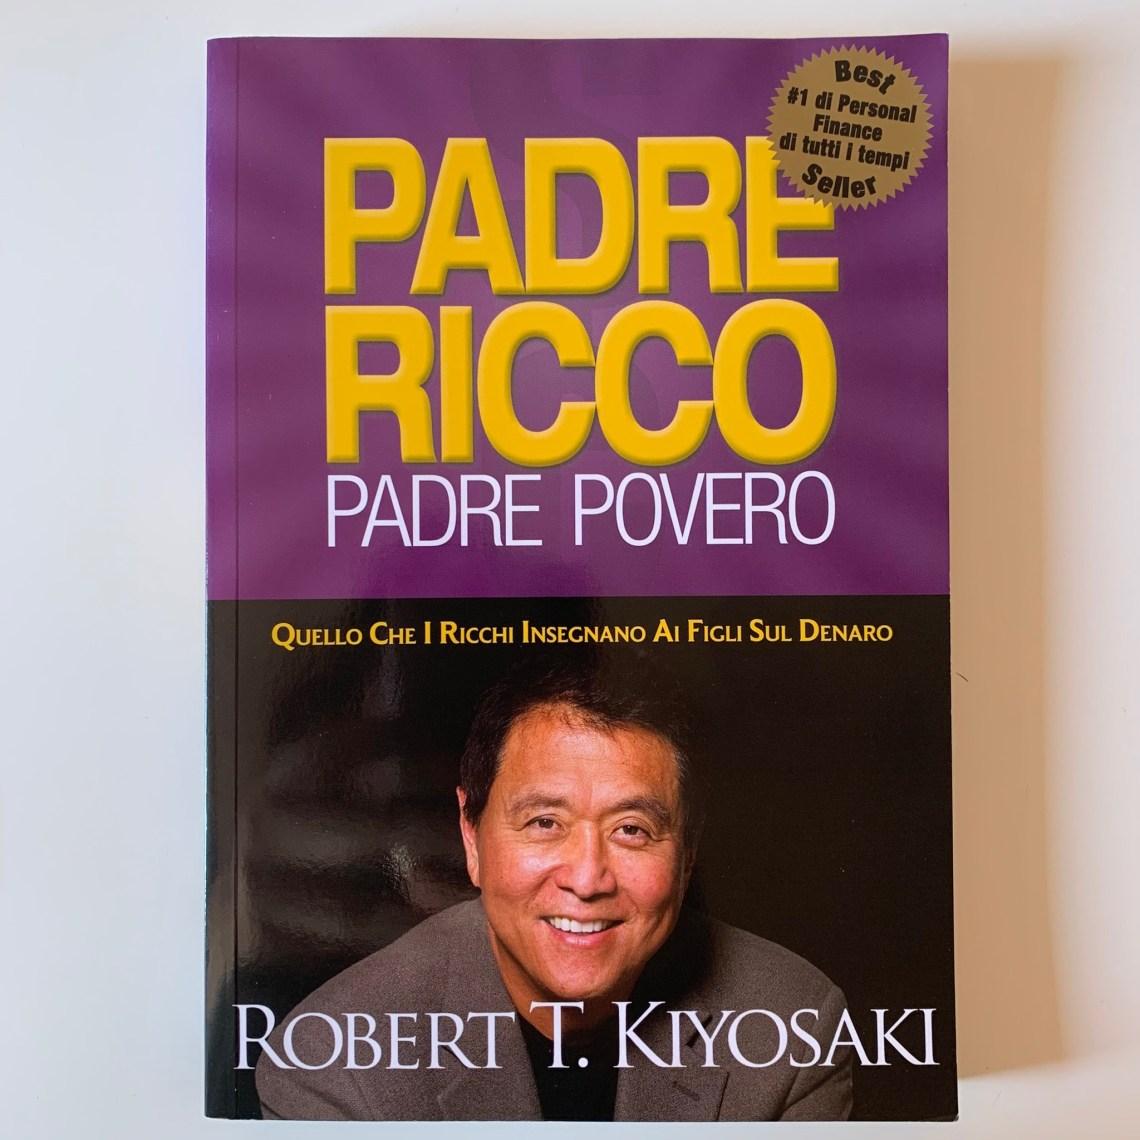 Padre ricco padre povero di Robert Kiyosakii